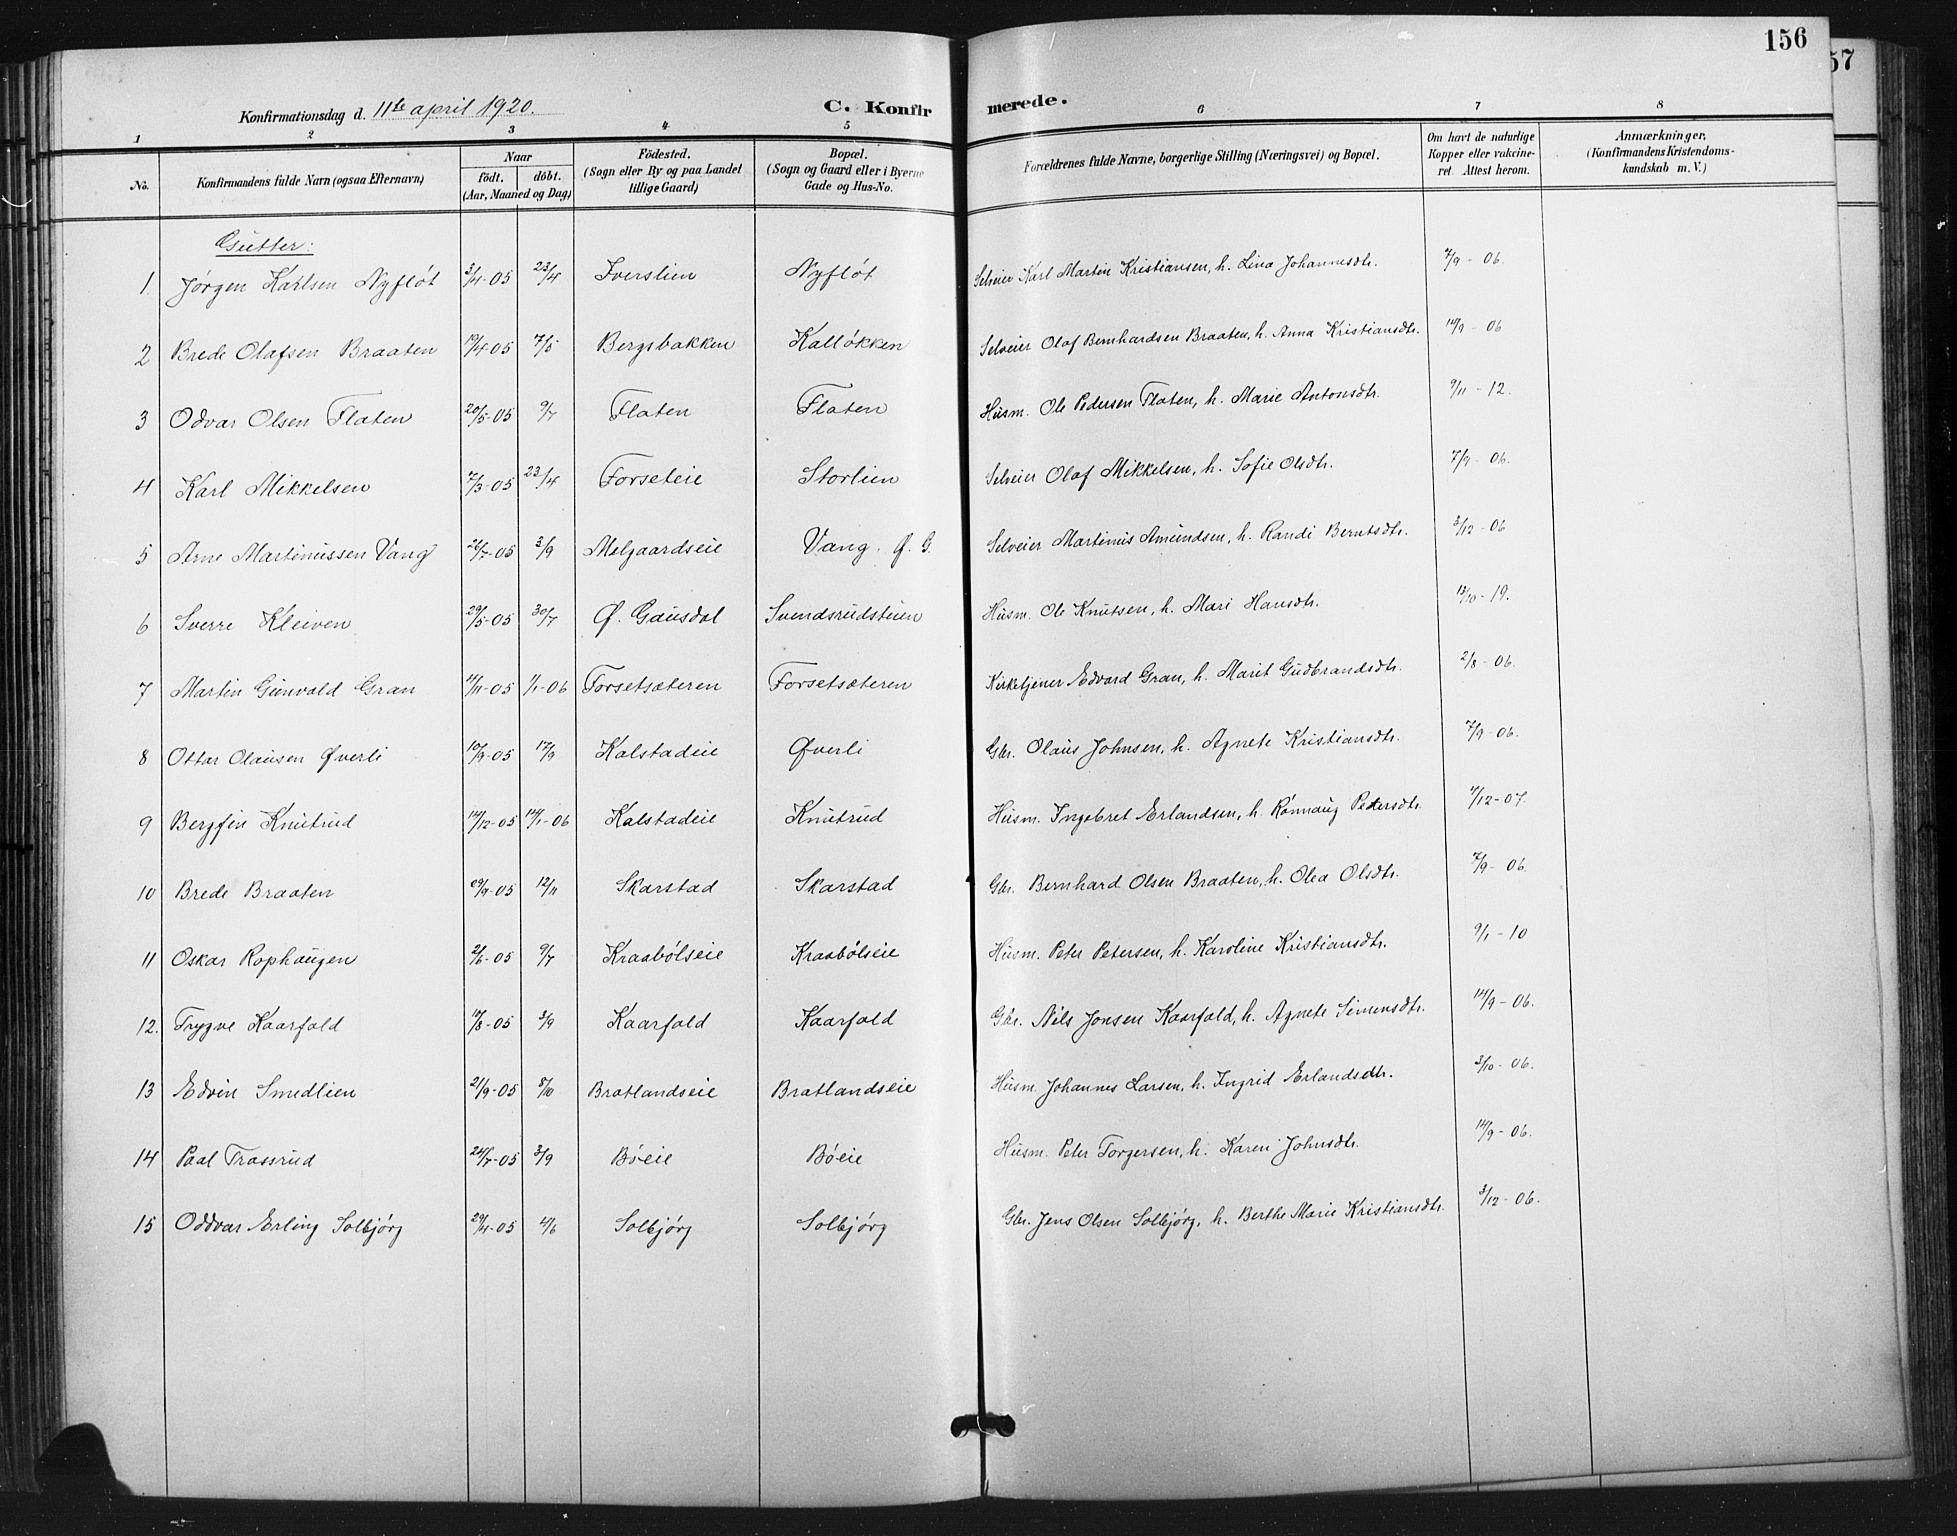 SAH, Vestre Gausdal prestekontor, Klokkerbok nr. 3, 1896-1925, s. 156